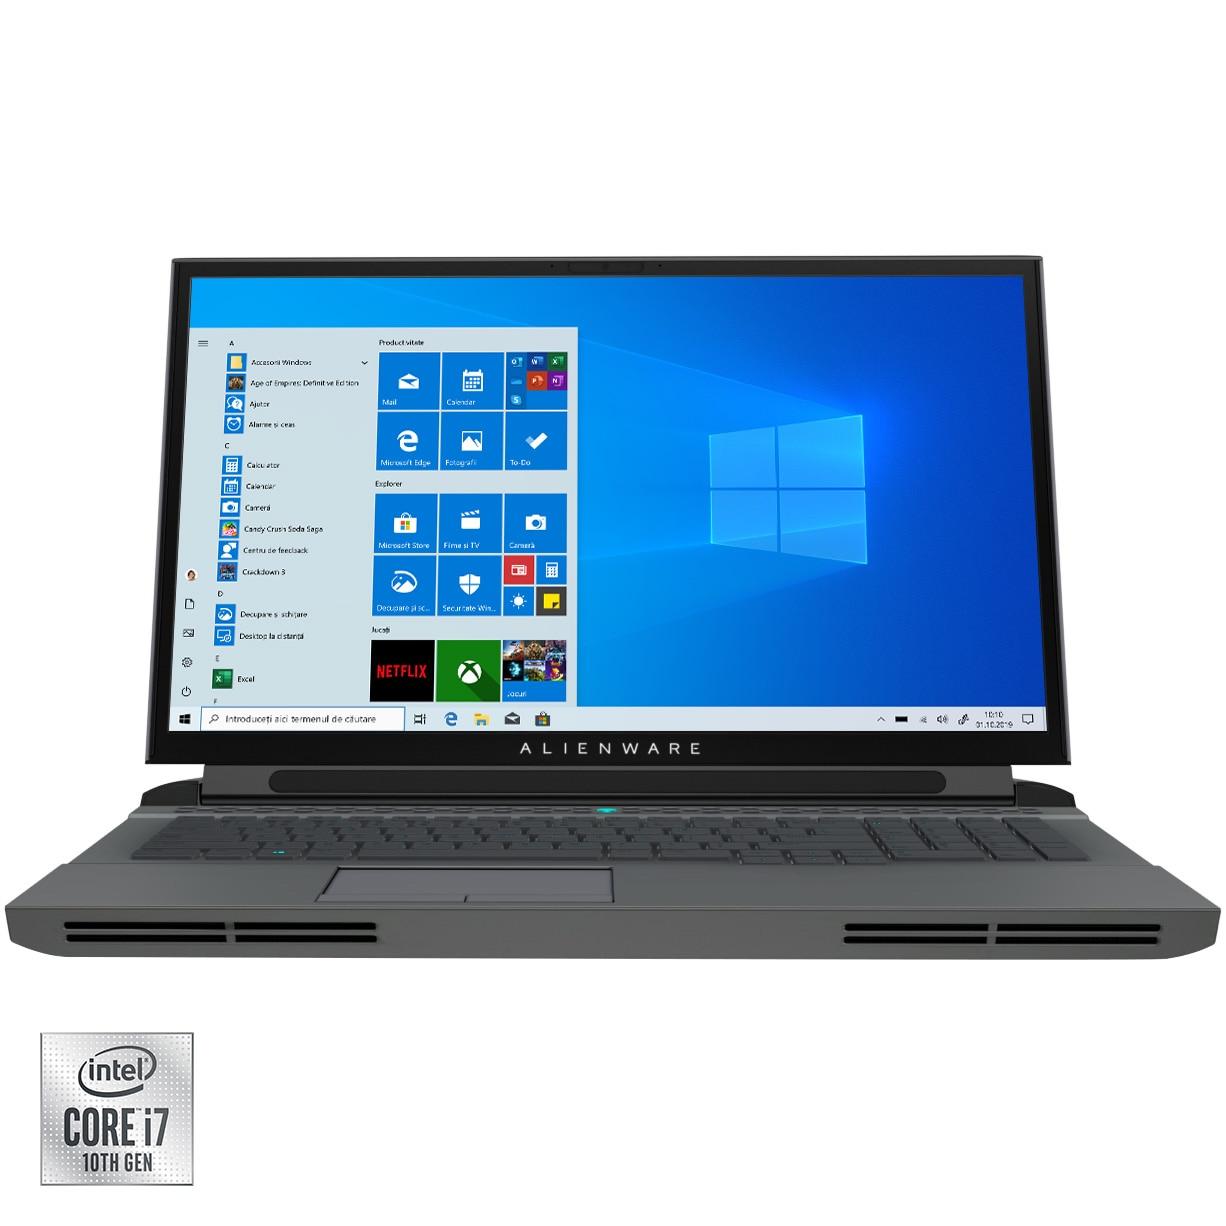 "Fotografie Laptop Gaming Alienware Area 51M R2 cu procesor Intel Core i7-10700K pana la 5.10 GHz, 17.3"", Full HD, 300Hz, 16GB, 512GB SSD, NVIDIA GeForce RTX 2070 SUPER 8GB, Windows 10 Pro, Dark Side of the Moon"